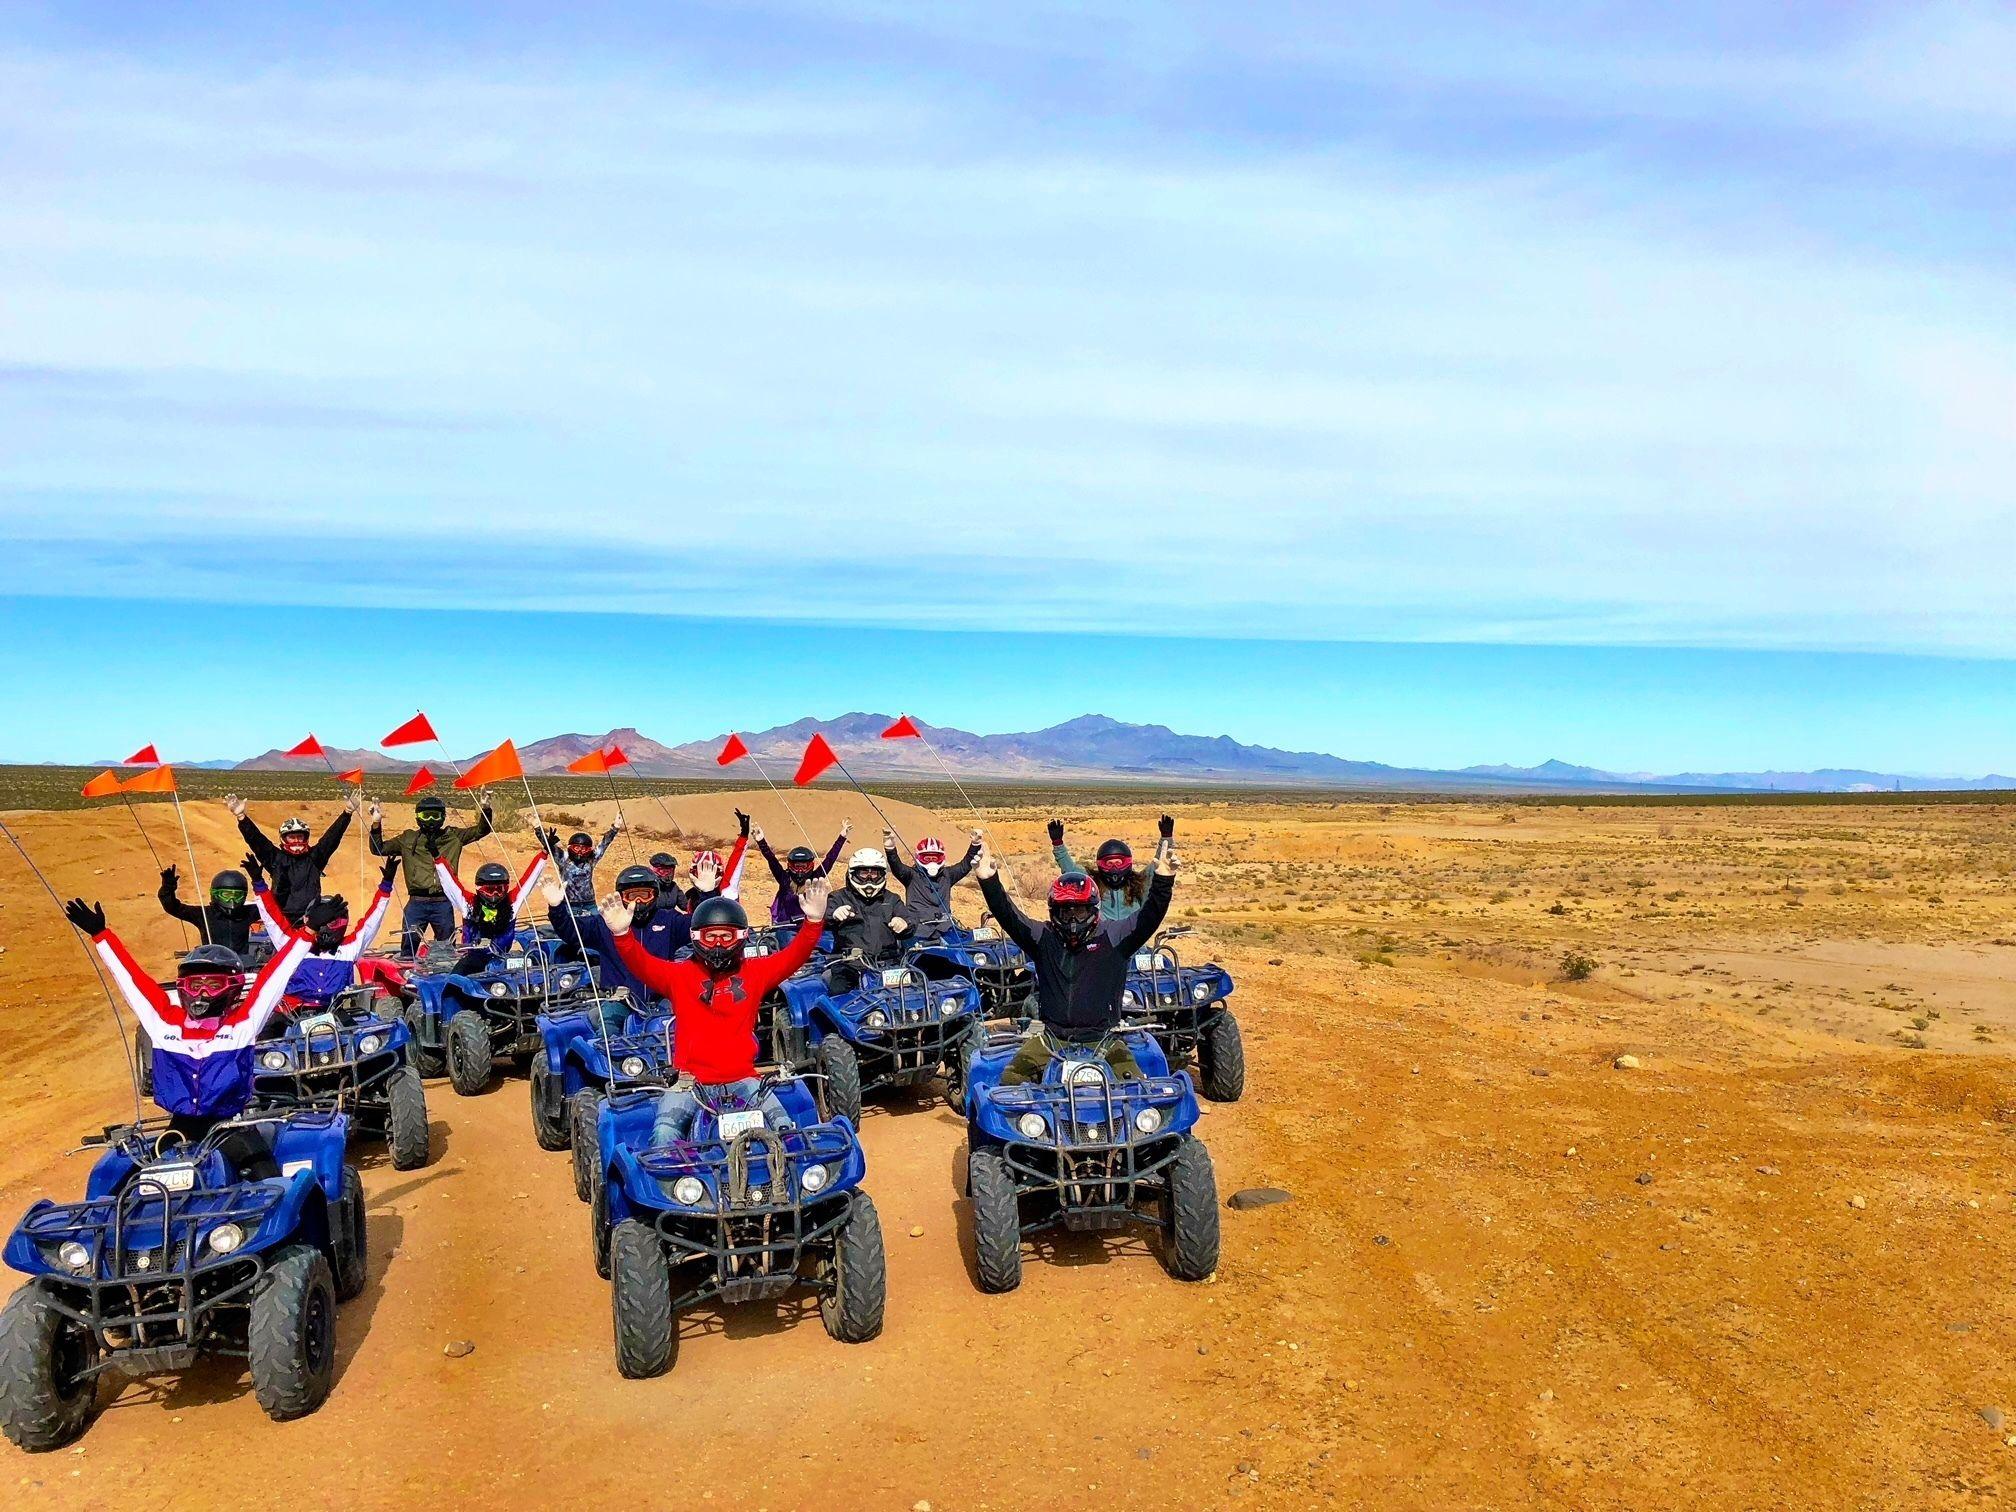 4 Hour Mojave Desert Quad bike Tour with Hamburger Lunch